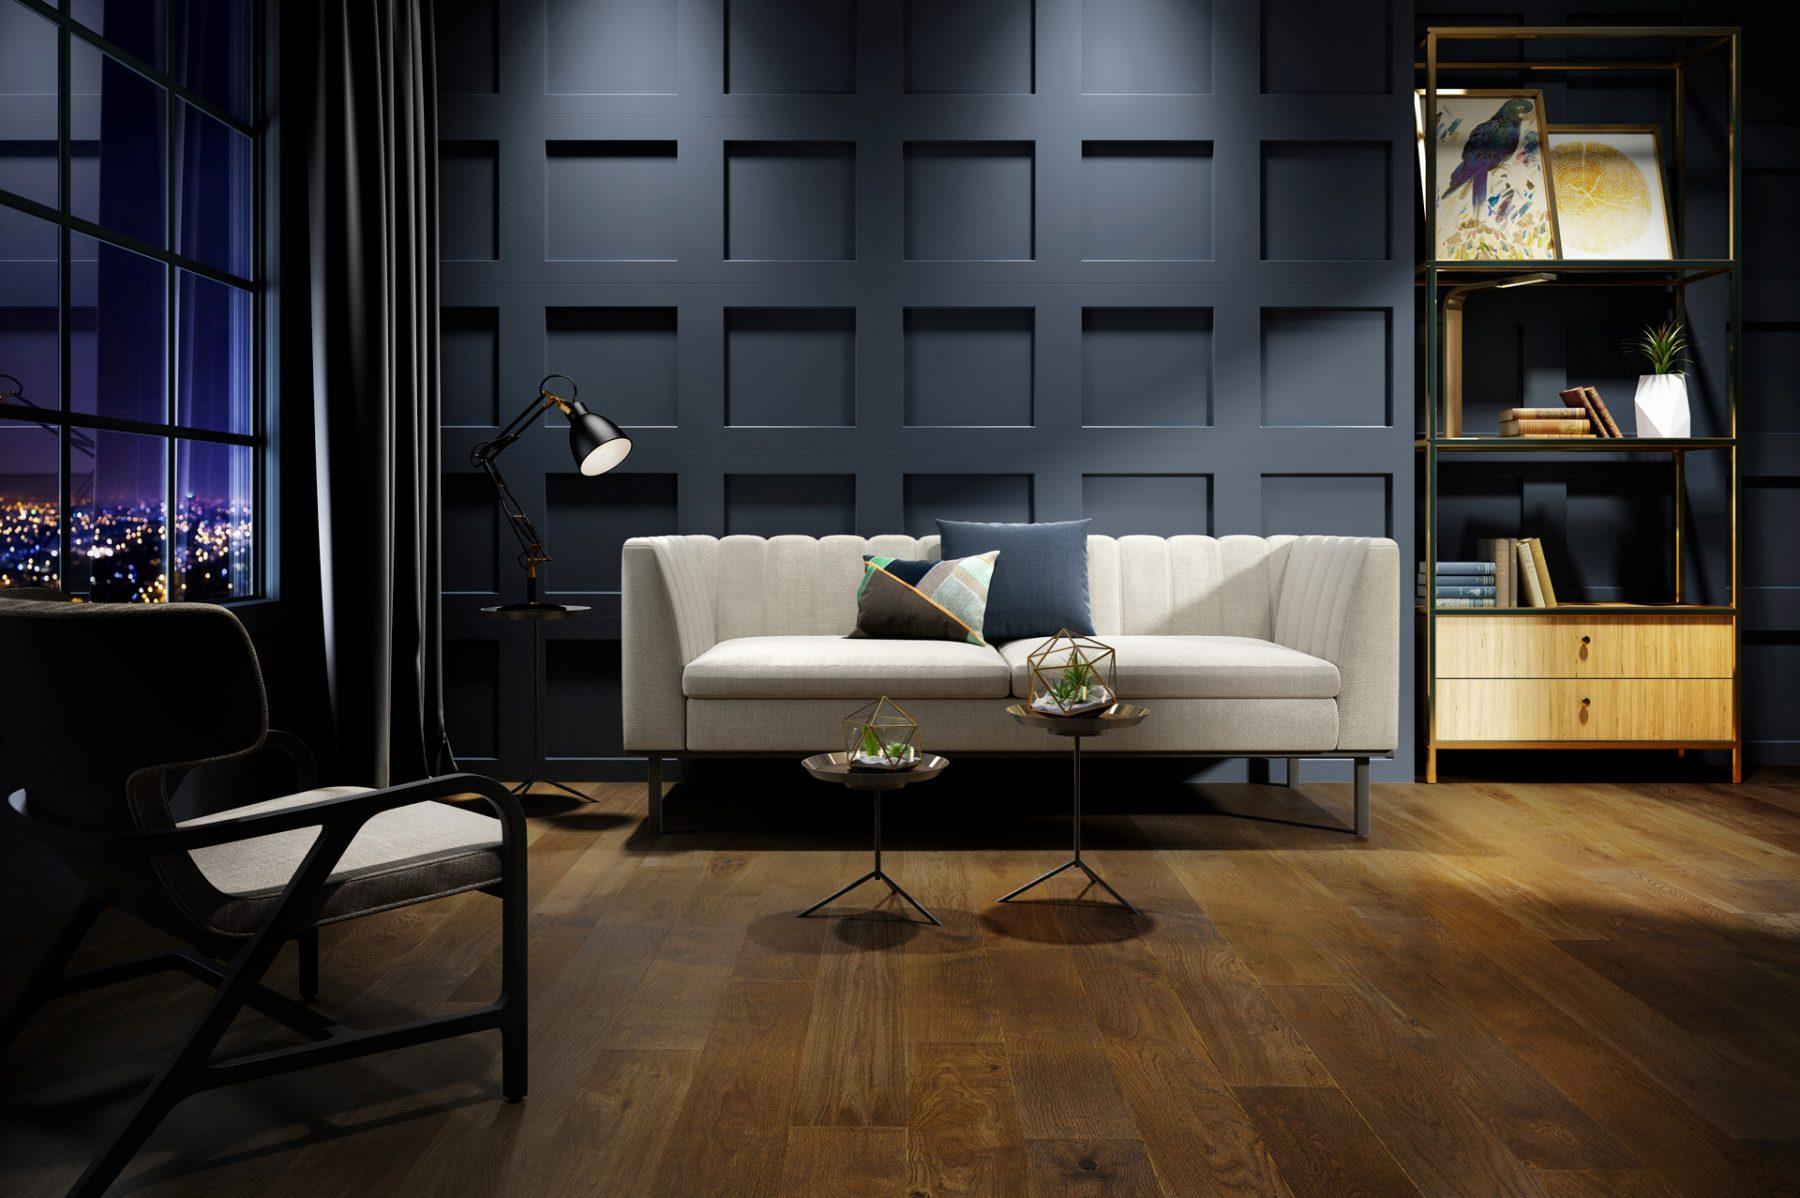 3d-animation-software-dark-living-room-lighting